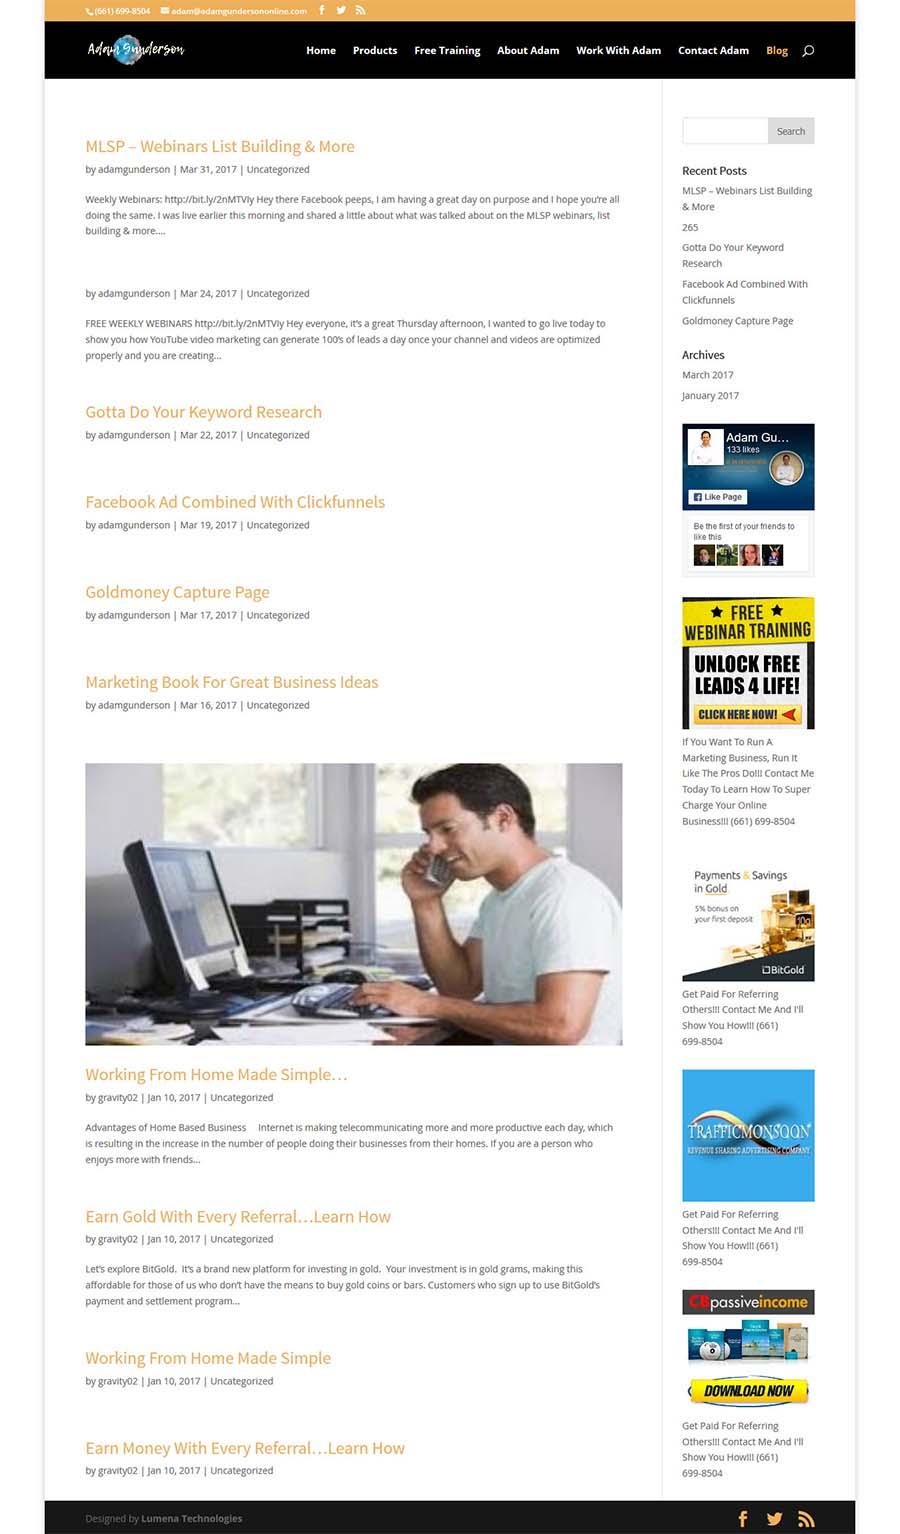 Owerri website design for adam gunderson online